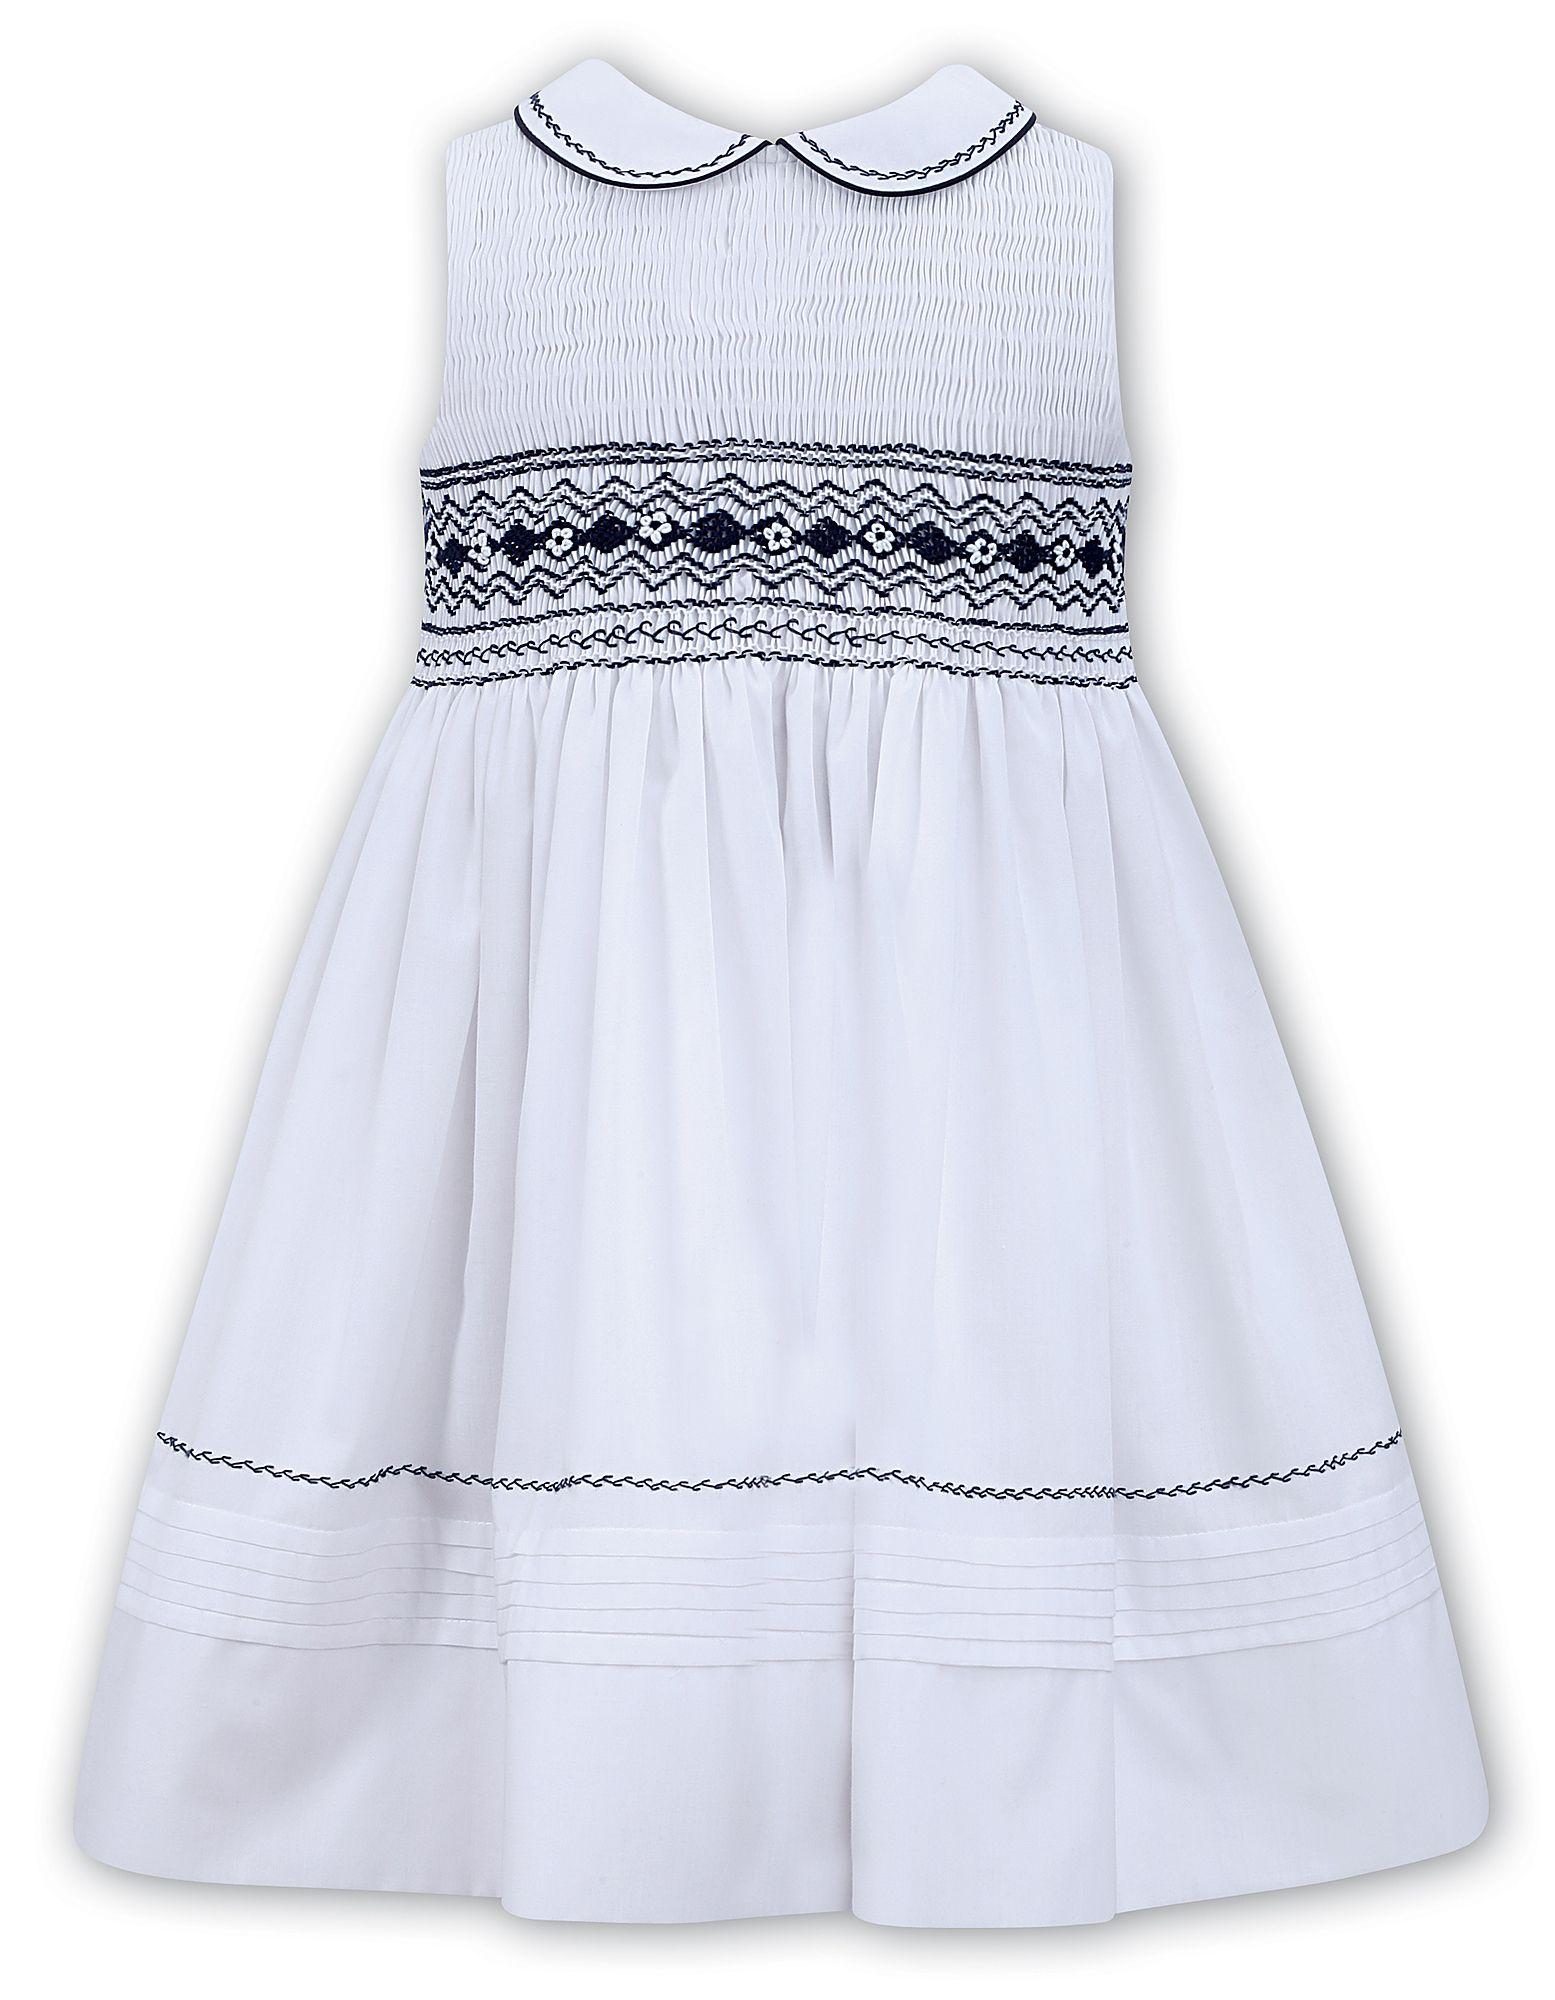 e1f5ccfa4f0 Sarah Louise Sleeveless White Dress With Full Smocked Top Navy Detaili